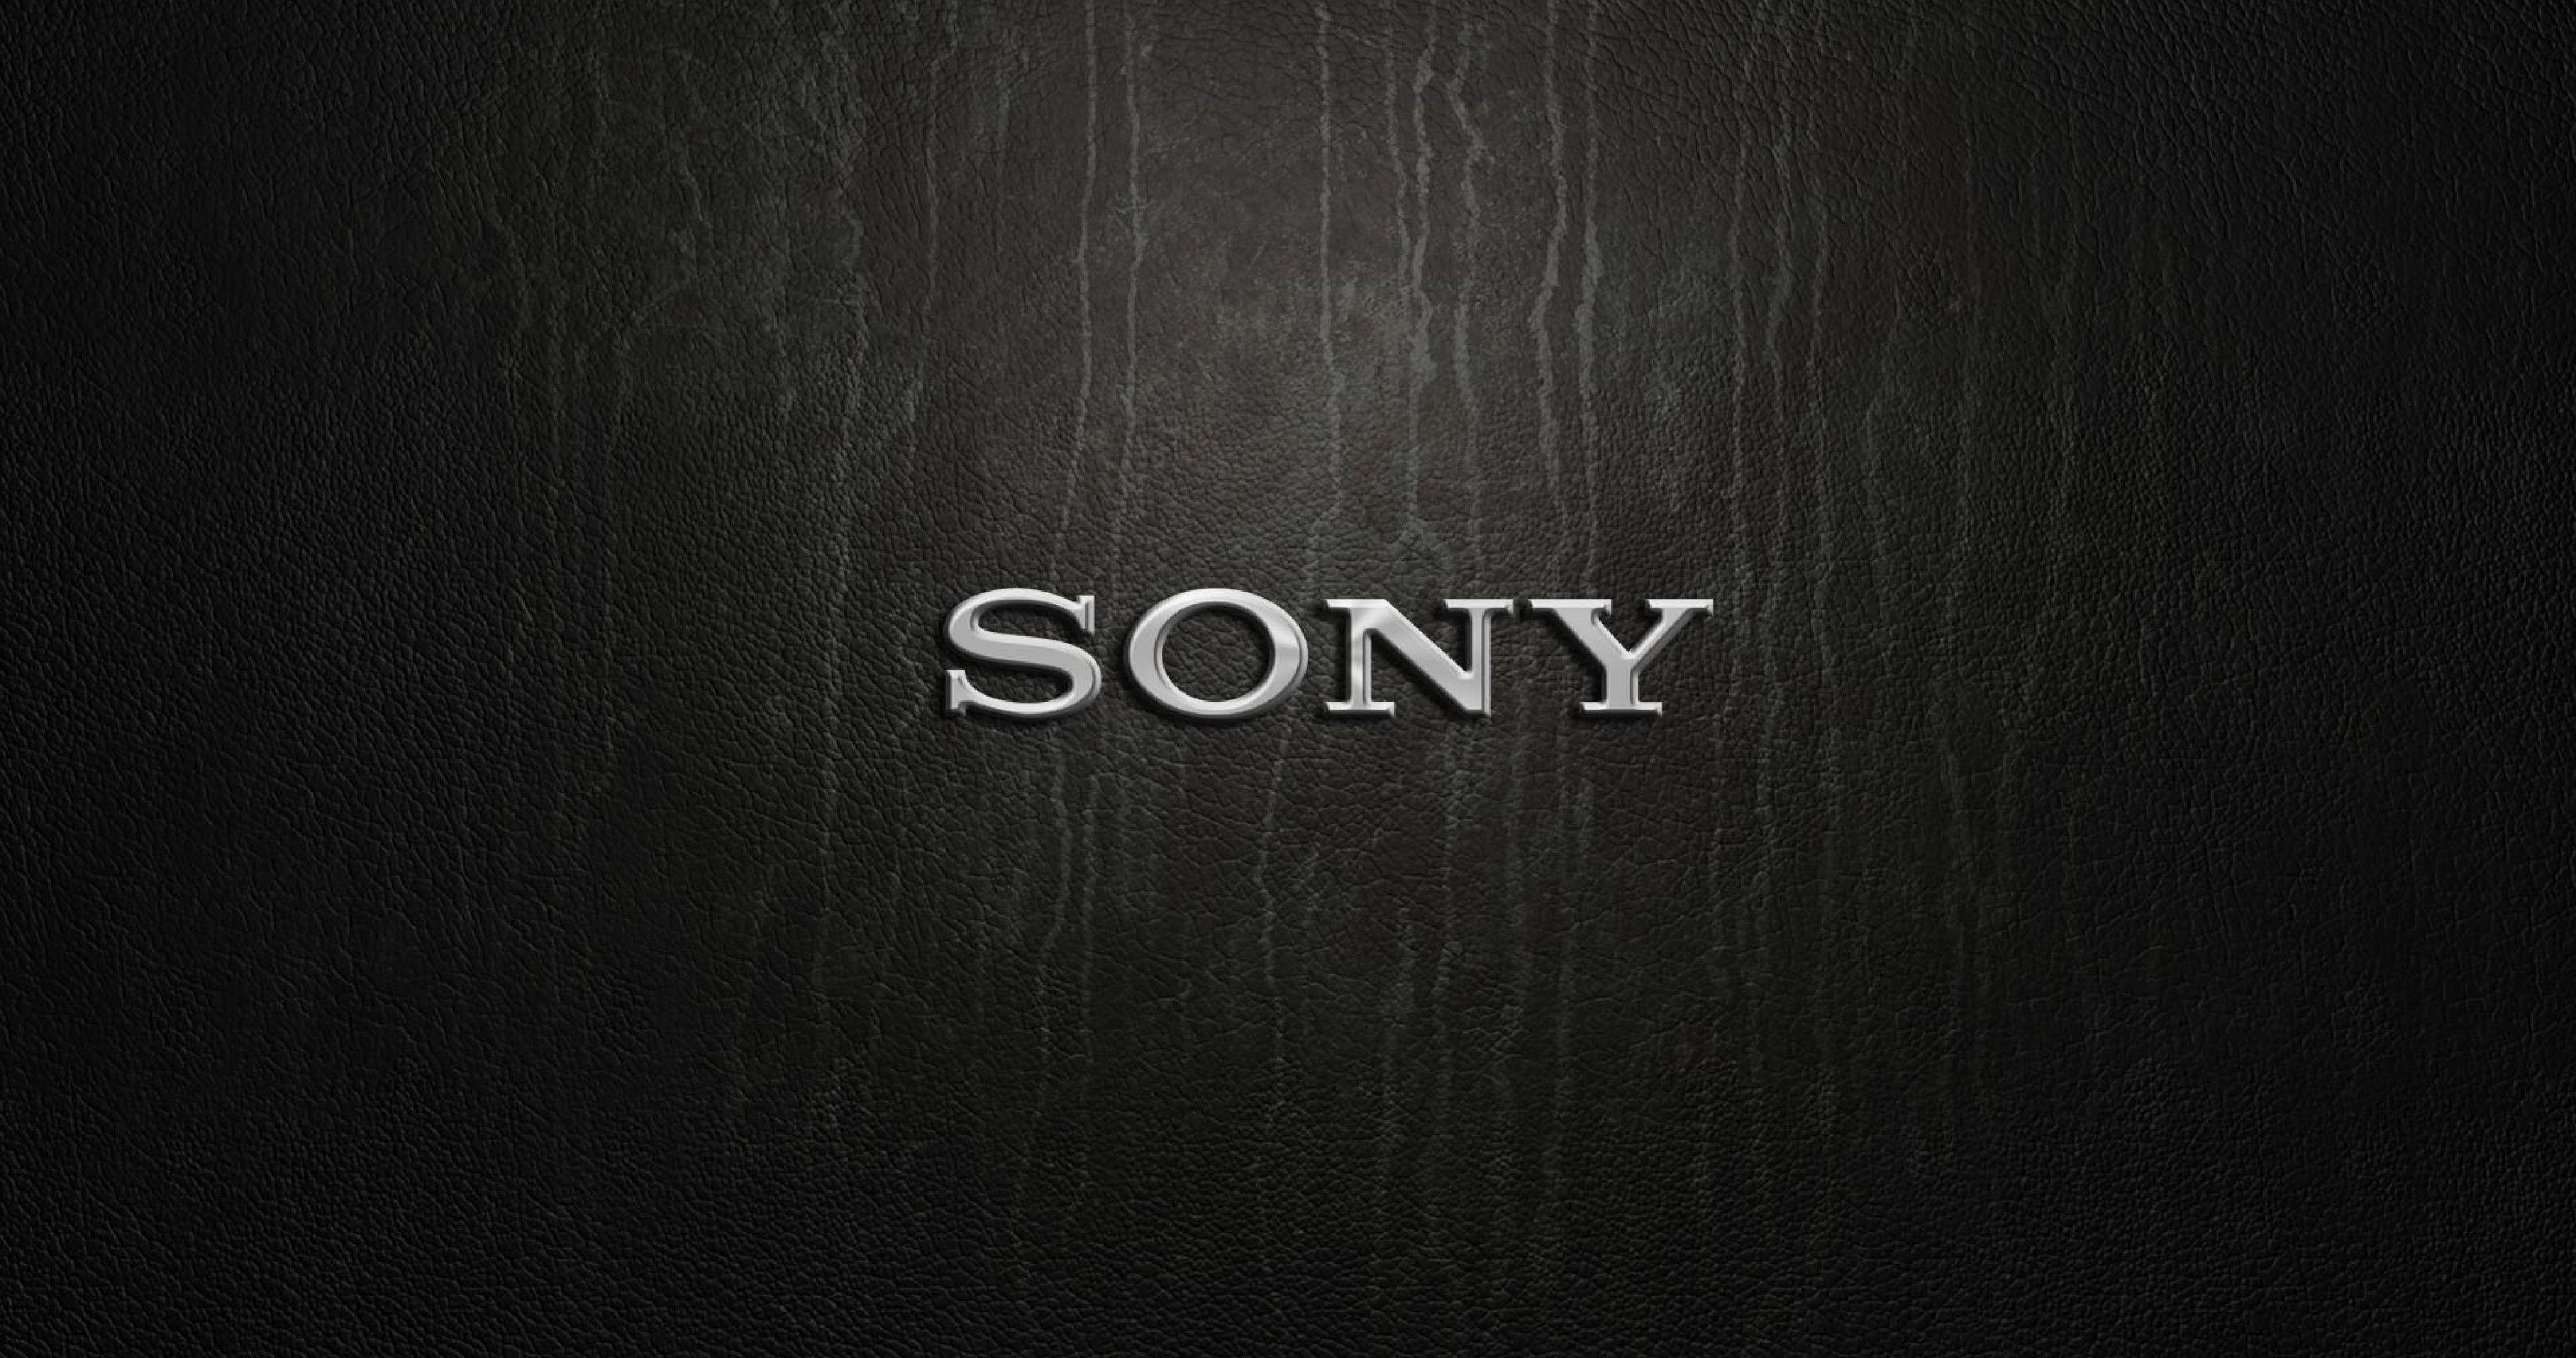 51 Best Free Sony Logo Wallpapers Wallpaperaccess